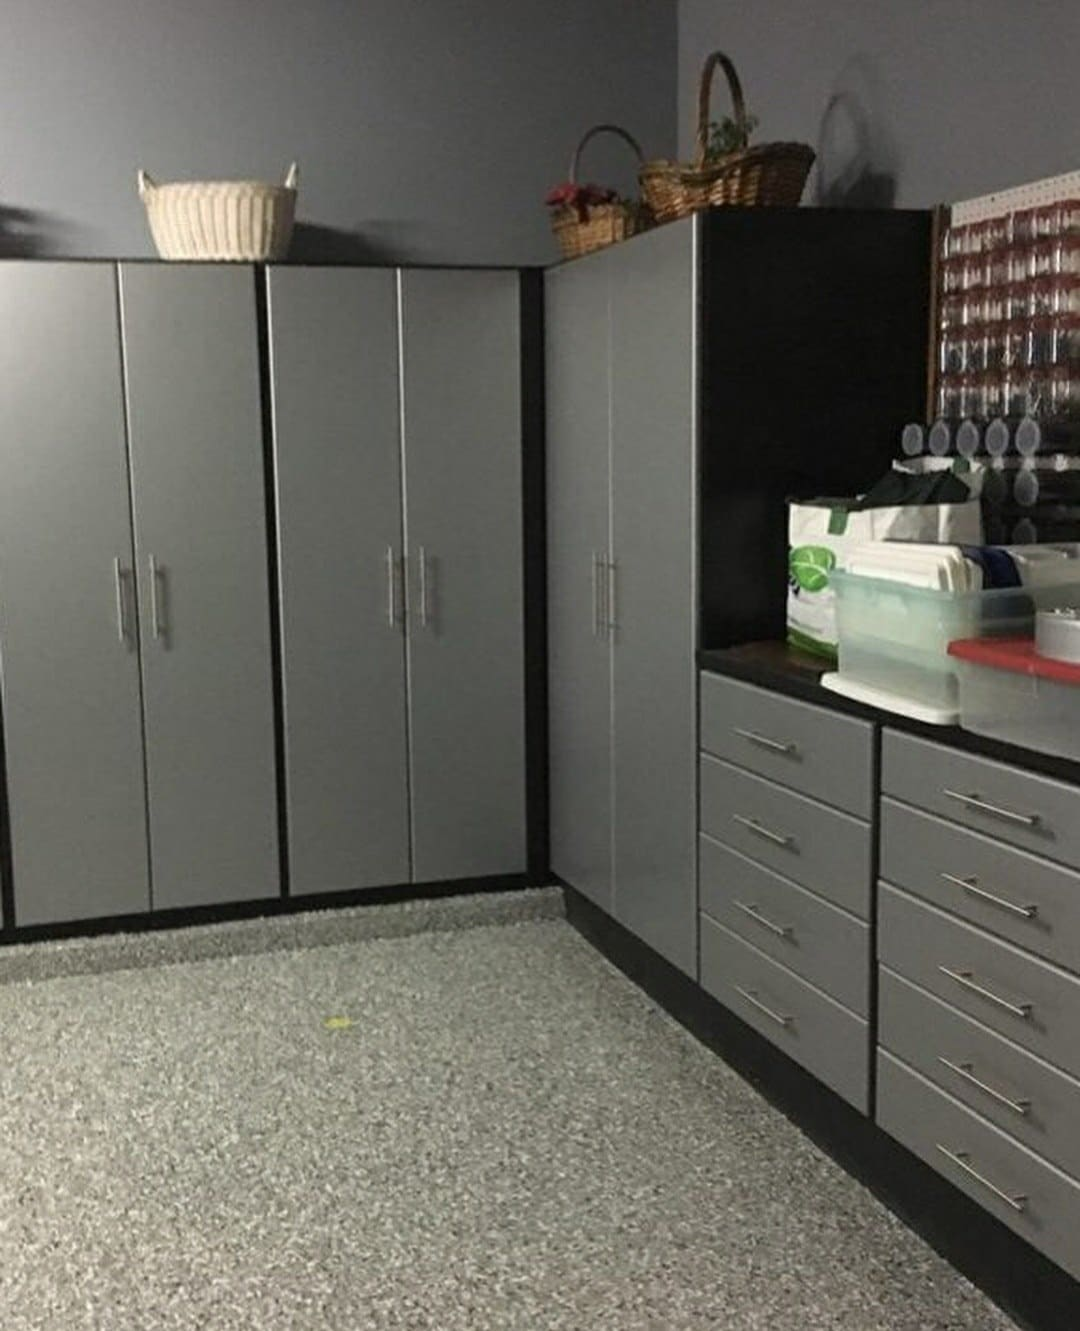 Garage storage cabinets by Closets by Design